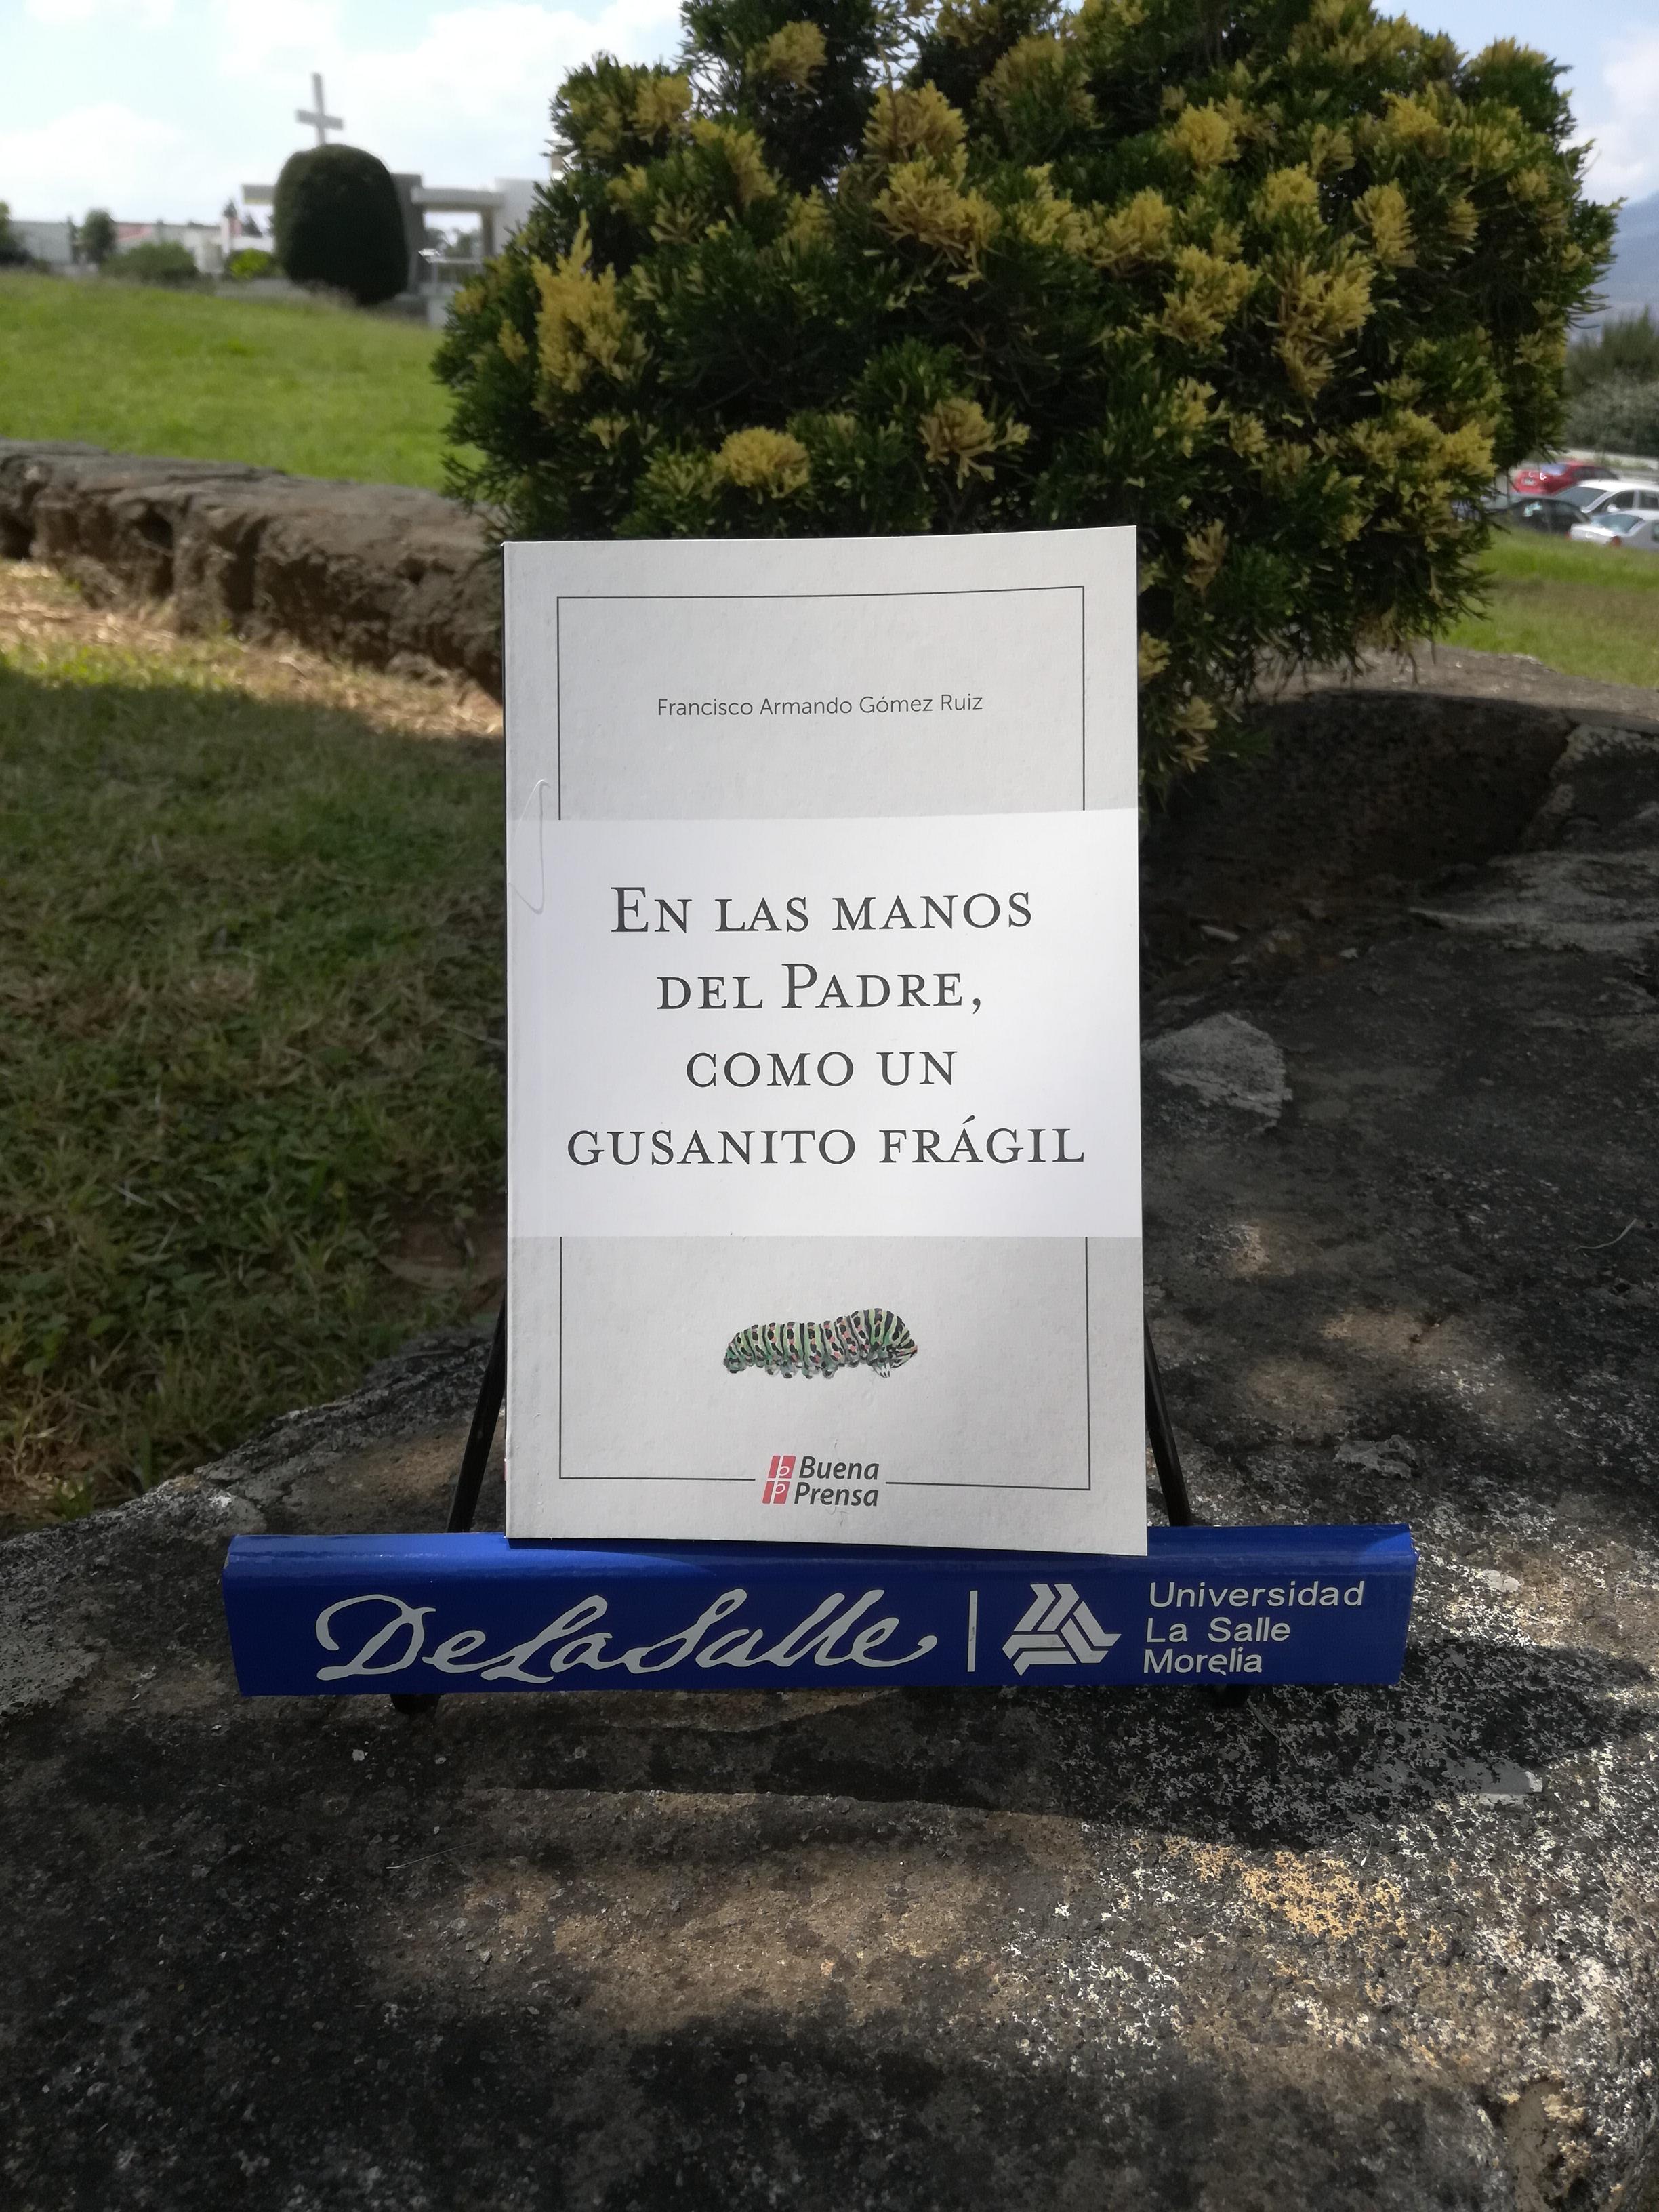 PRESENTAN INTERESANTE LIBRO EN LA SALLE MORELIA